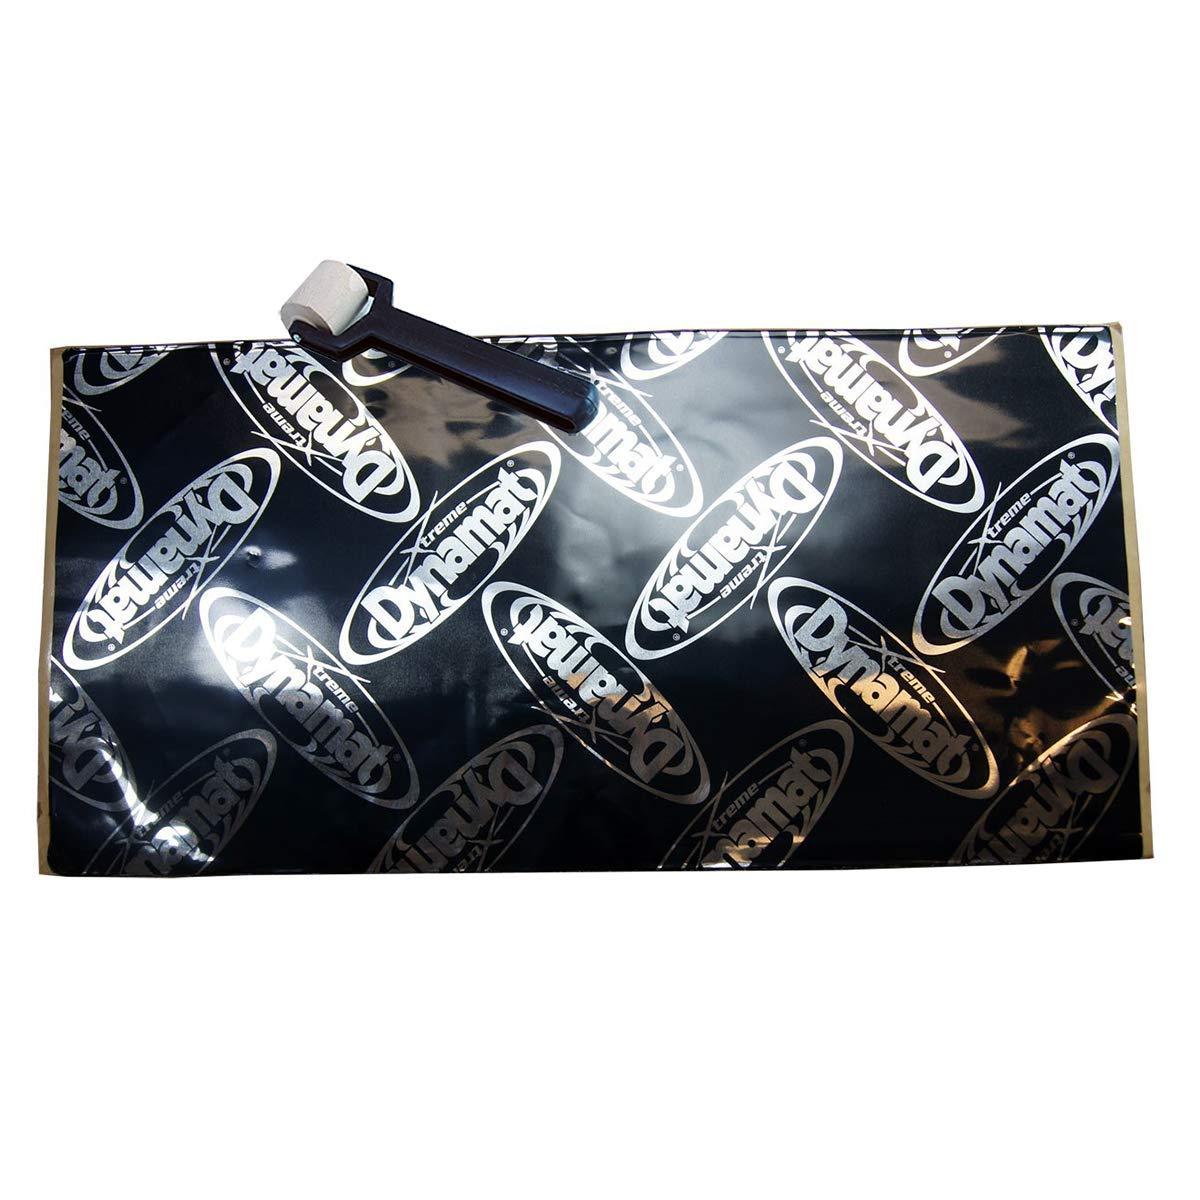 Dynamat Xtreme 4 Sq Ft Door Wedge Pack; 18'X32' 12volt Distributors 10425